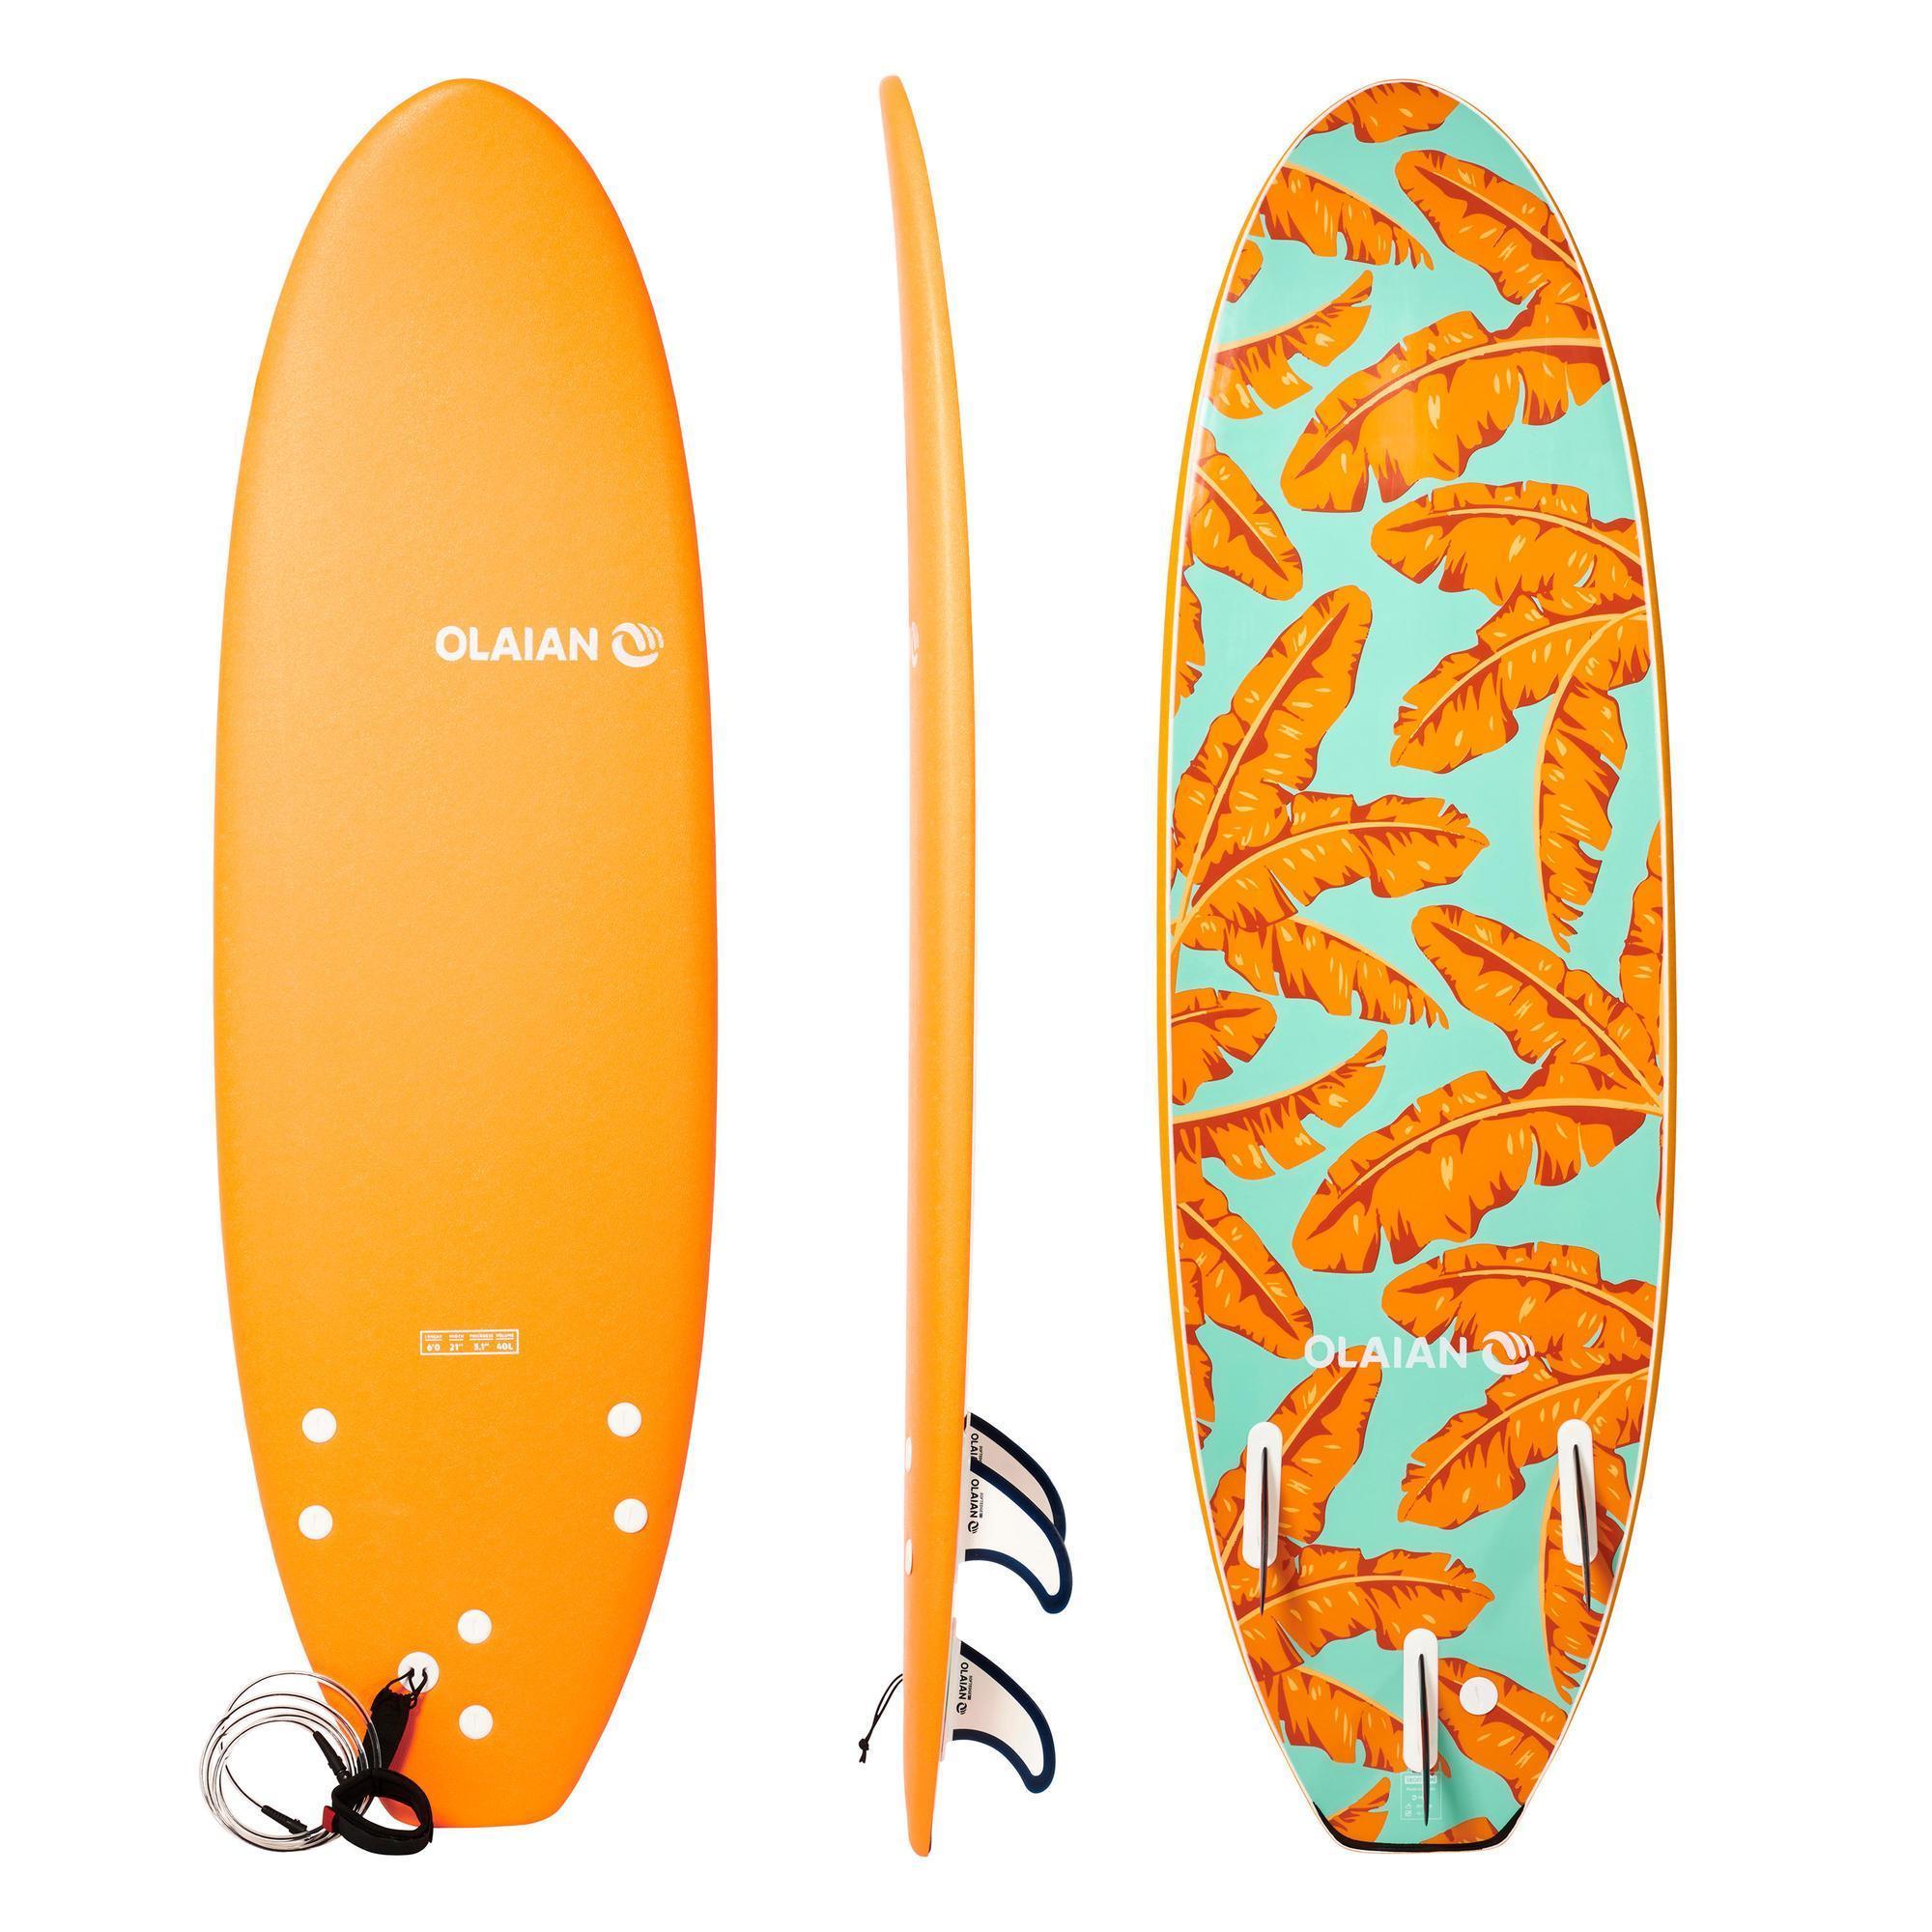 olaian tavola surf soft 500 6' con leash e 3 pinne